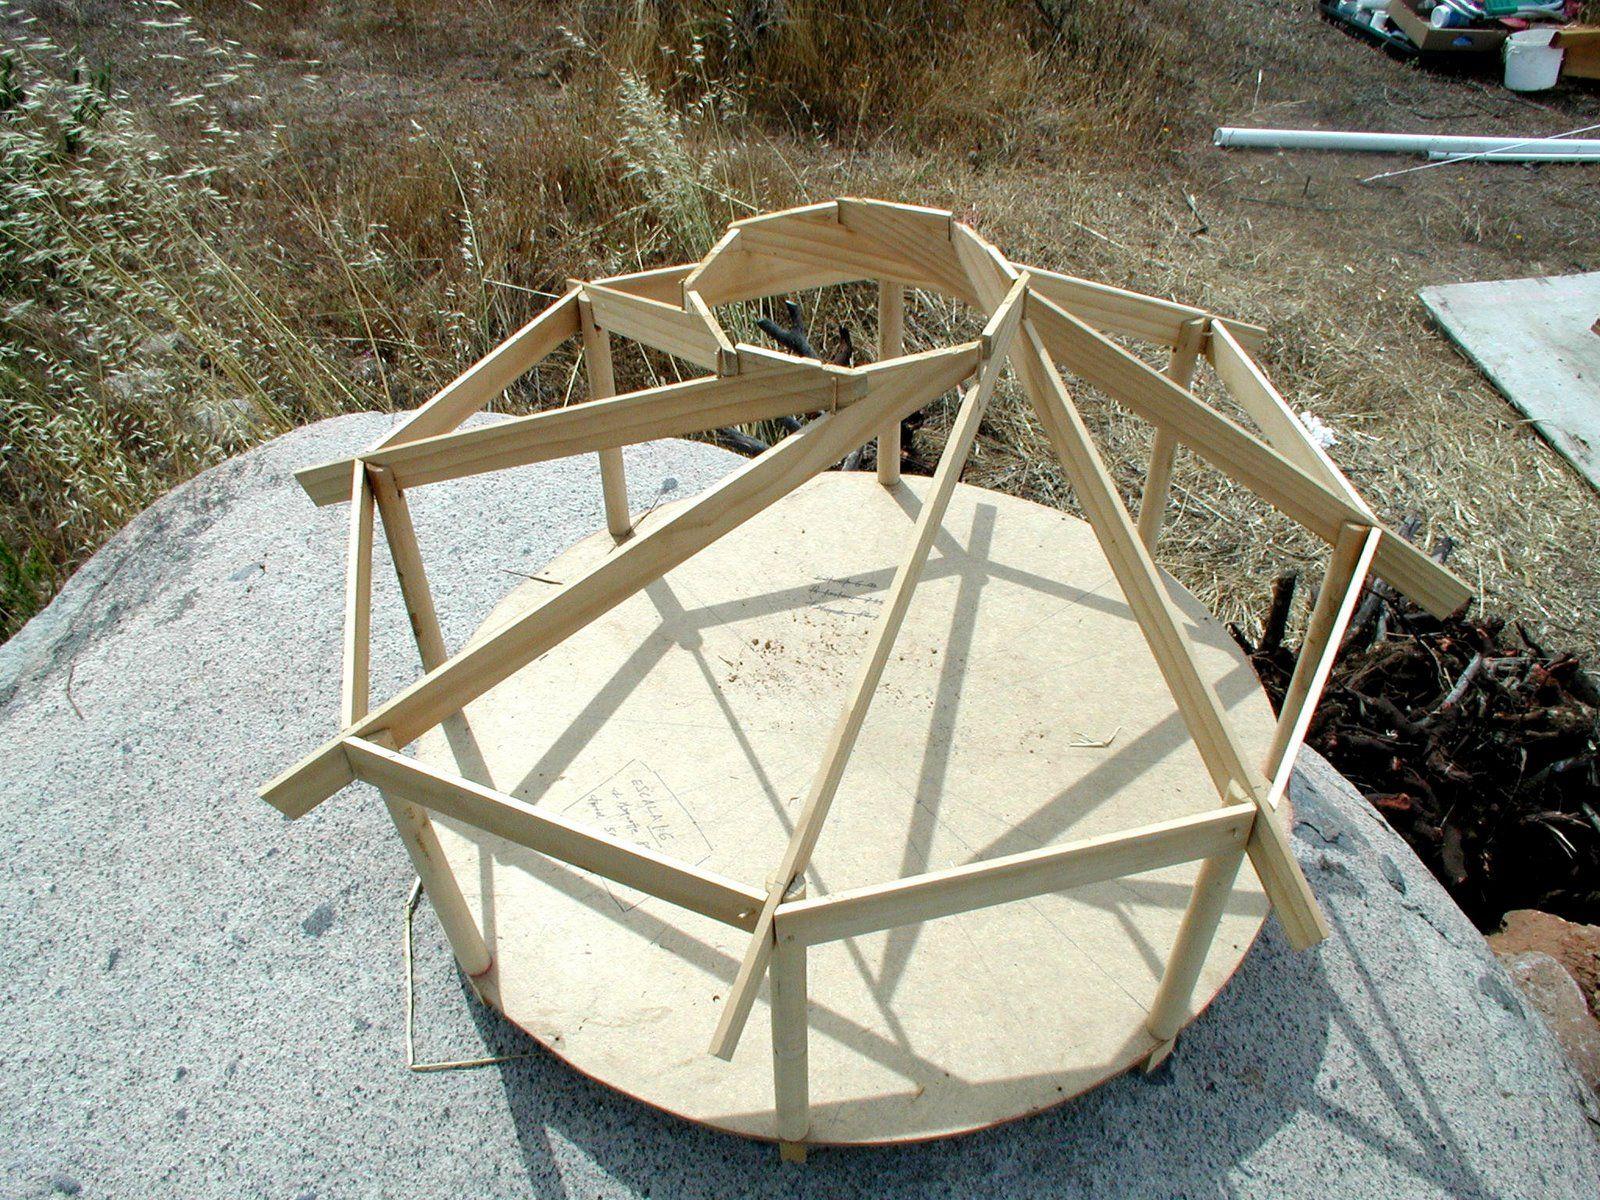 sol y barro the reciprocal roof pallets pinterest gartenh user dachs und tragwerk. Black Bedroom Furniture Sets. Home Design Ideas